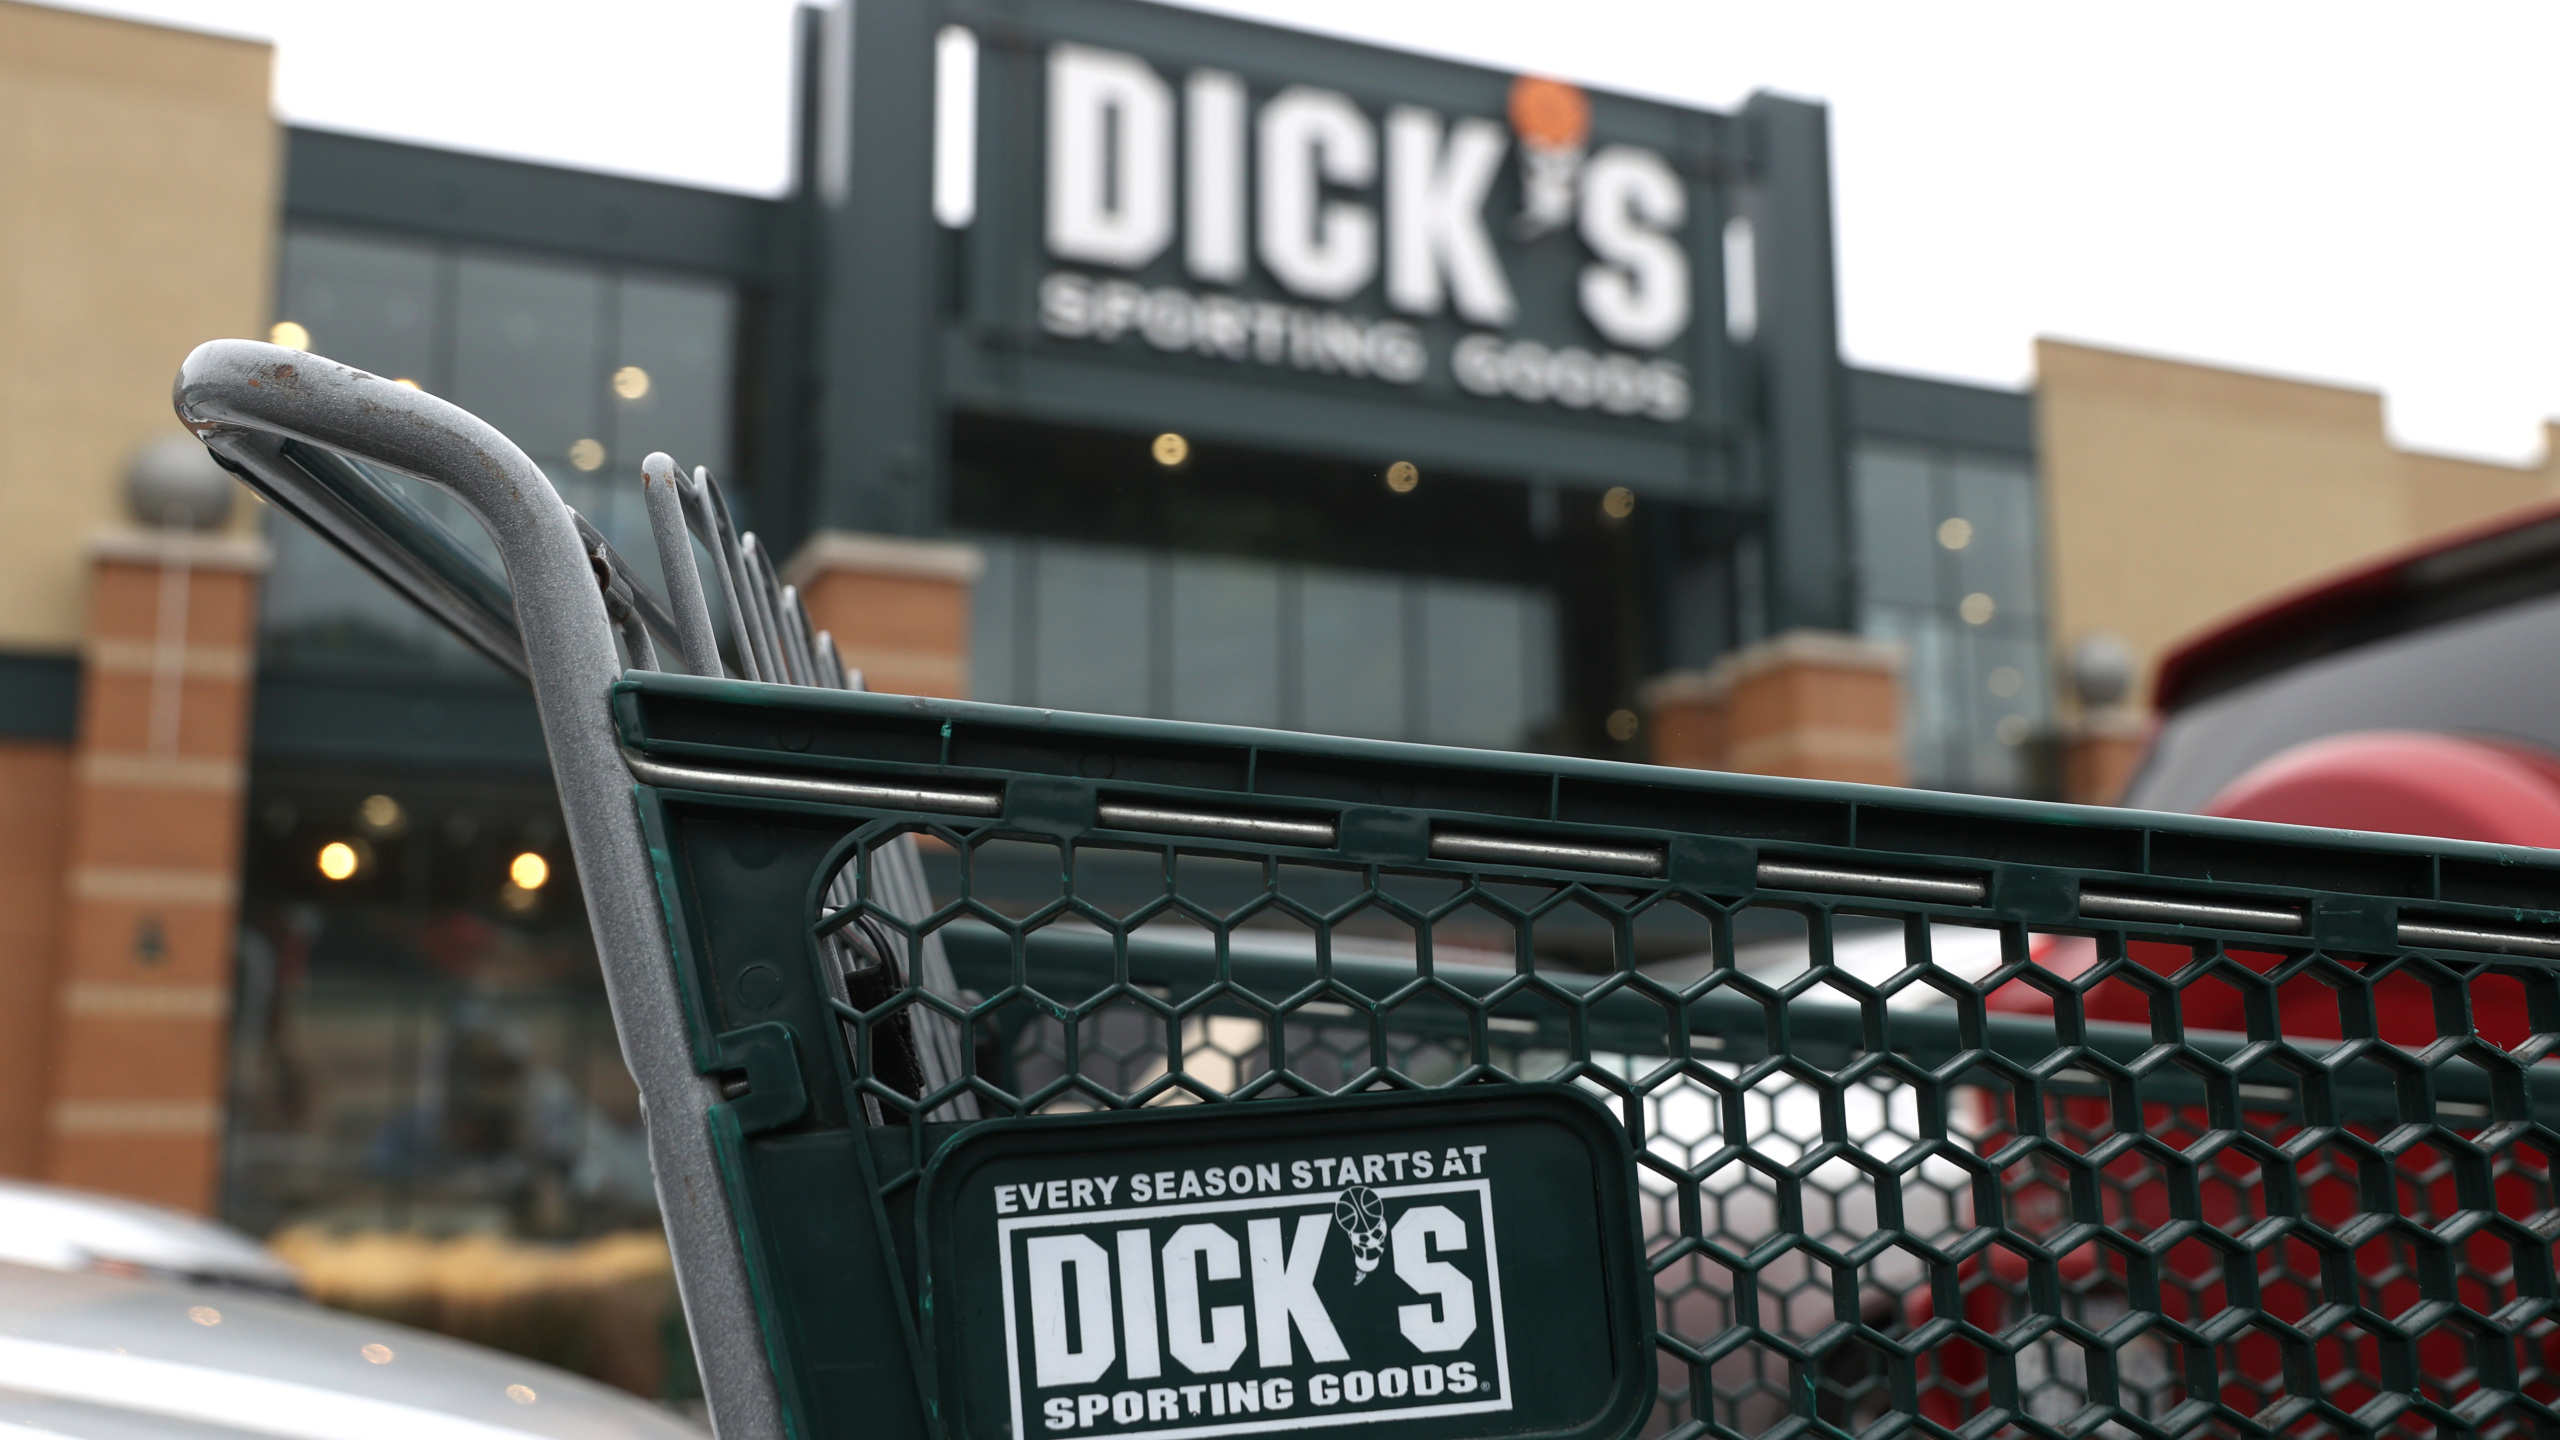 Dicks Sporting Goods hiring up to 9000 seasonal employees 2560x1440